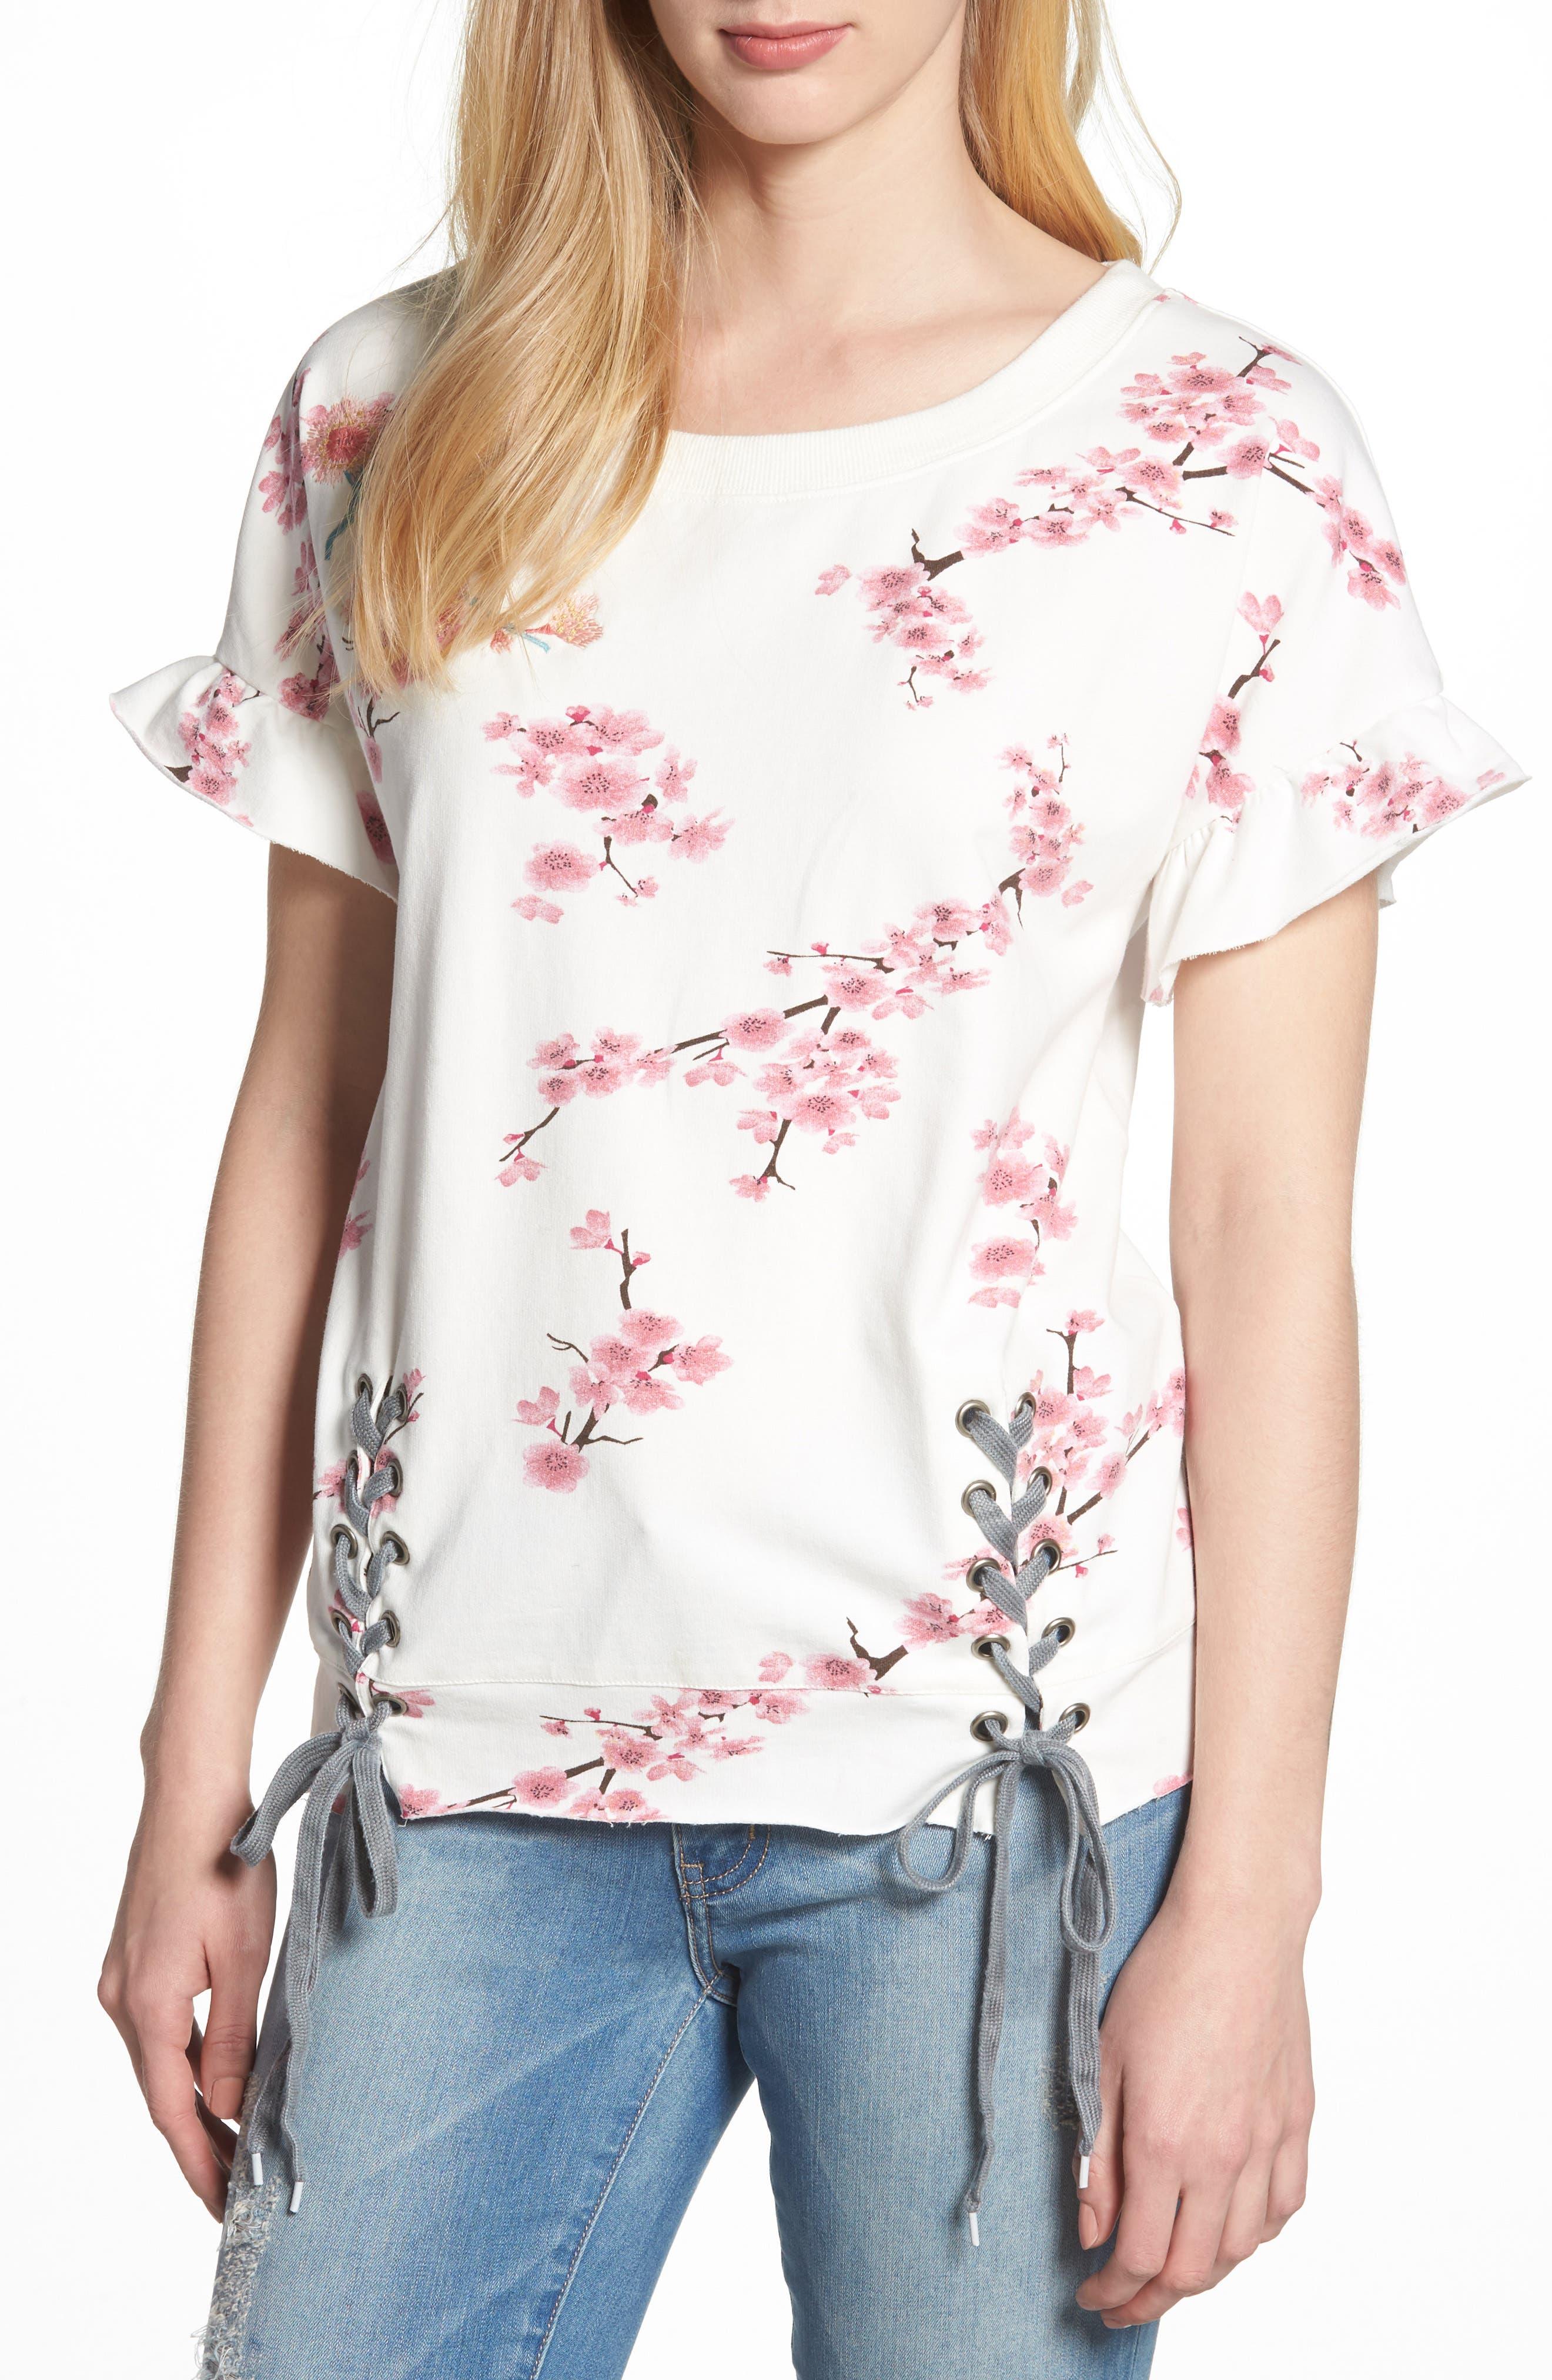 Short Sleeve Lace Up Cherry Blossom Sweatshirt,                             Main thumbnail 1, color,                             White Cherry Blossom